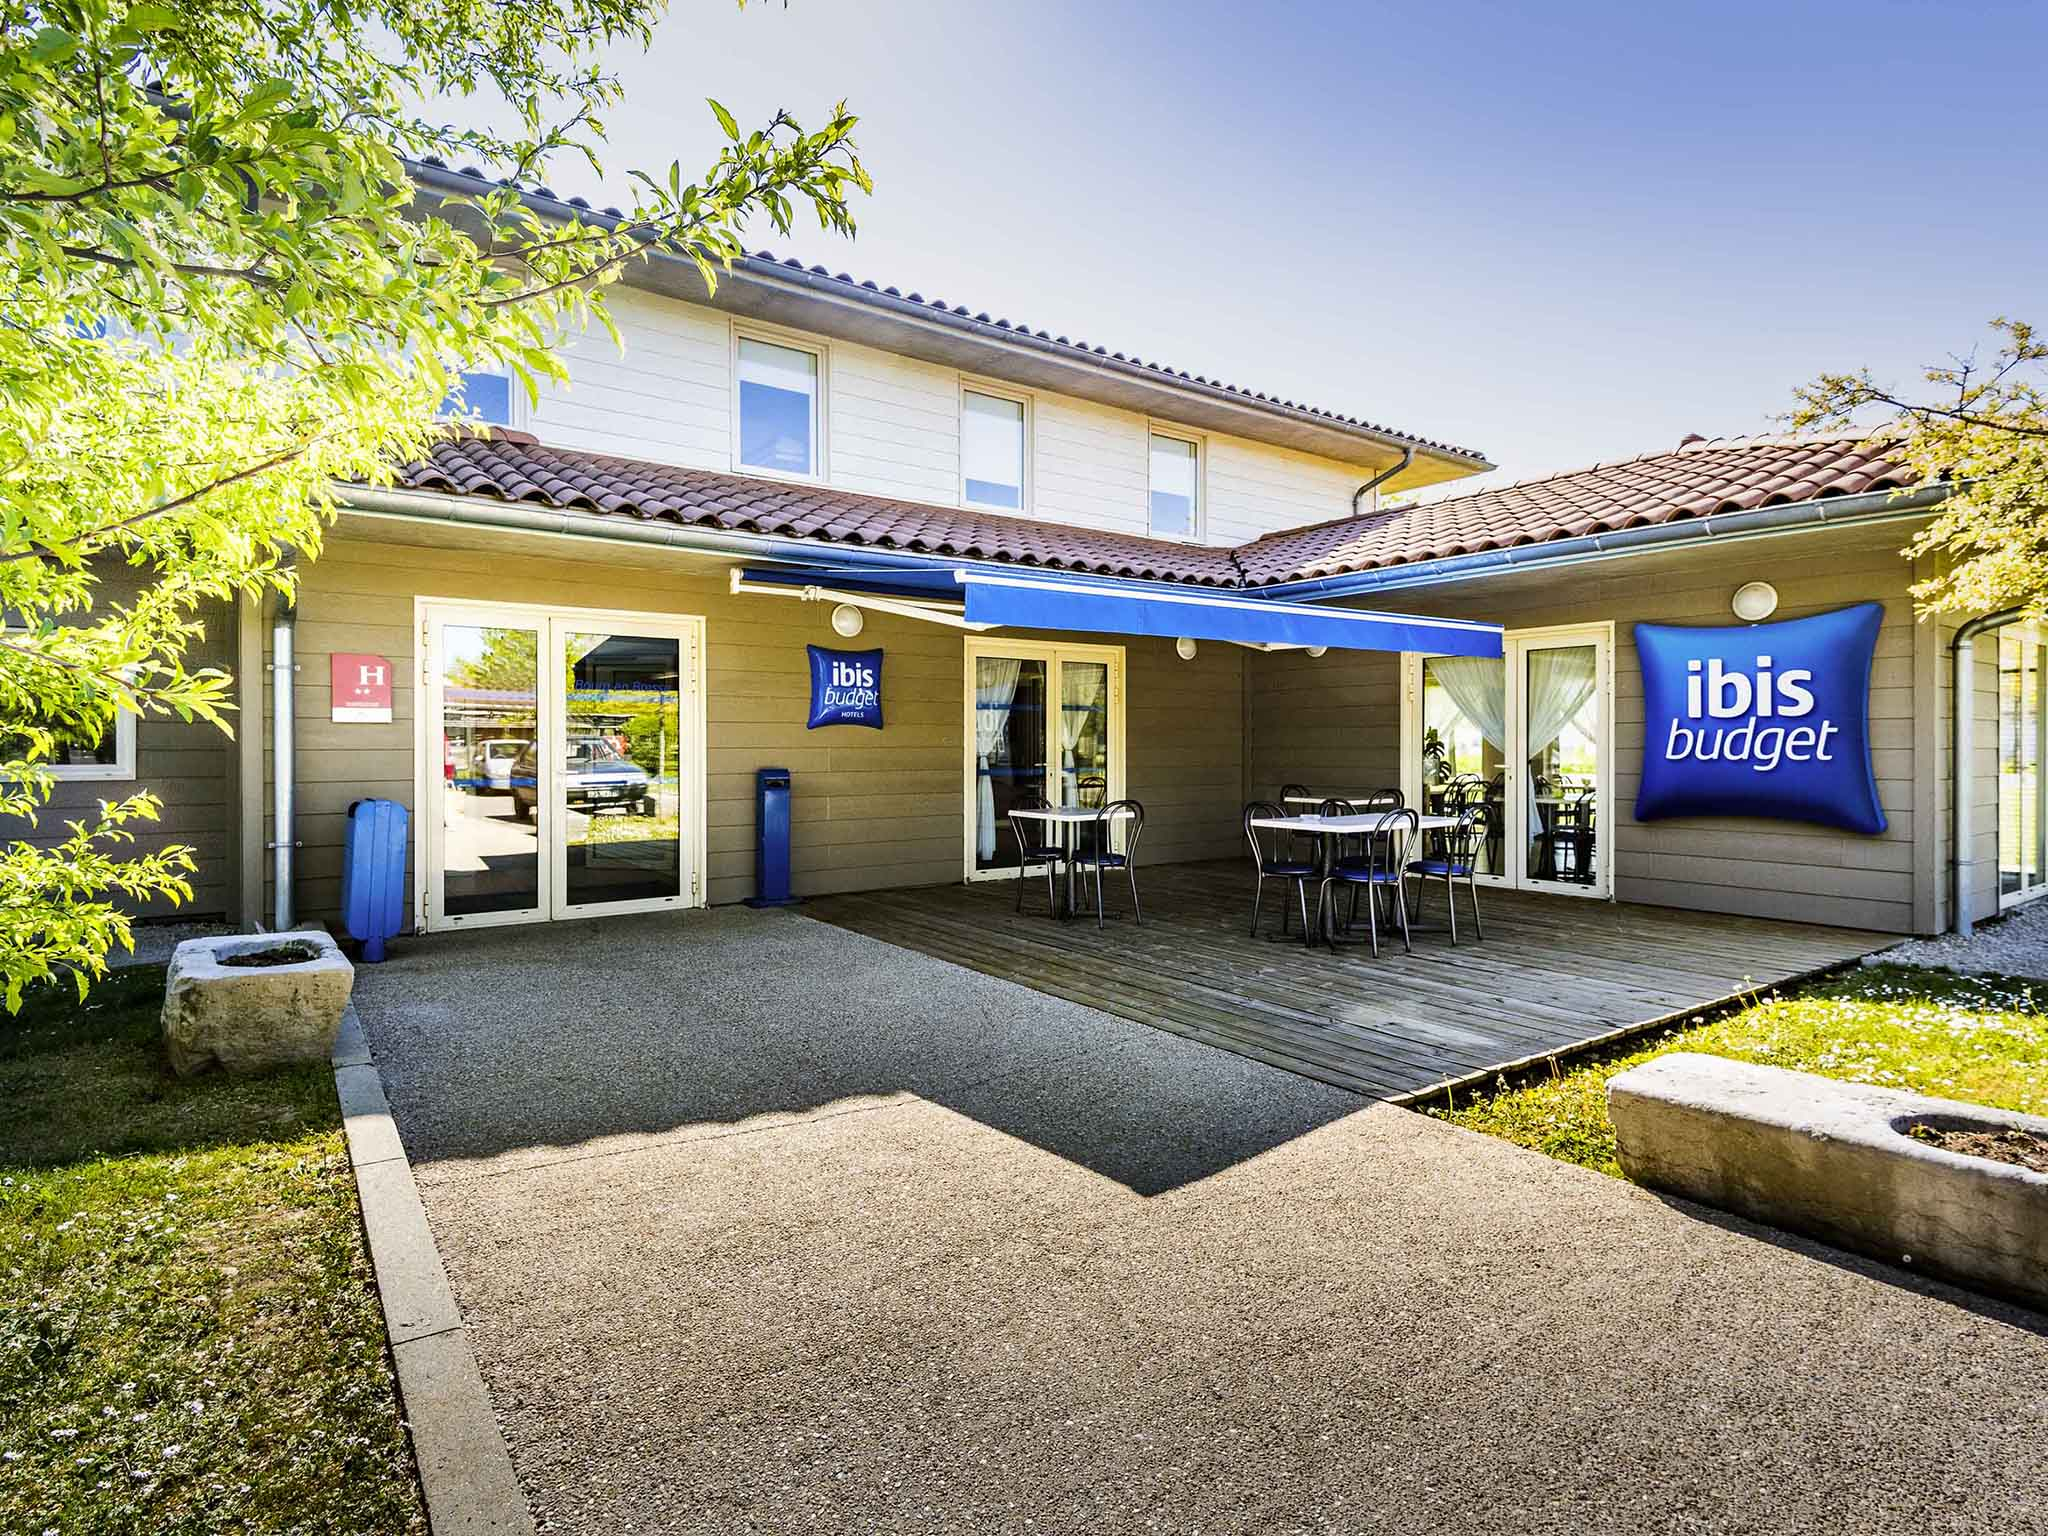 Hôtel - ibis budget Bourg-en-Bresse